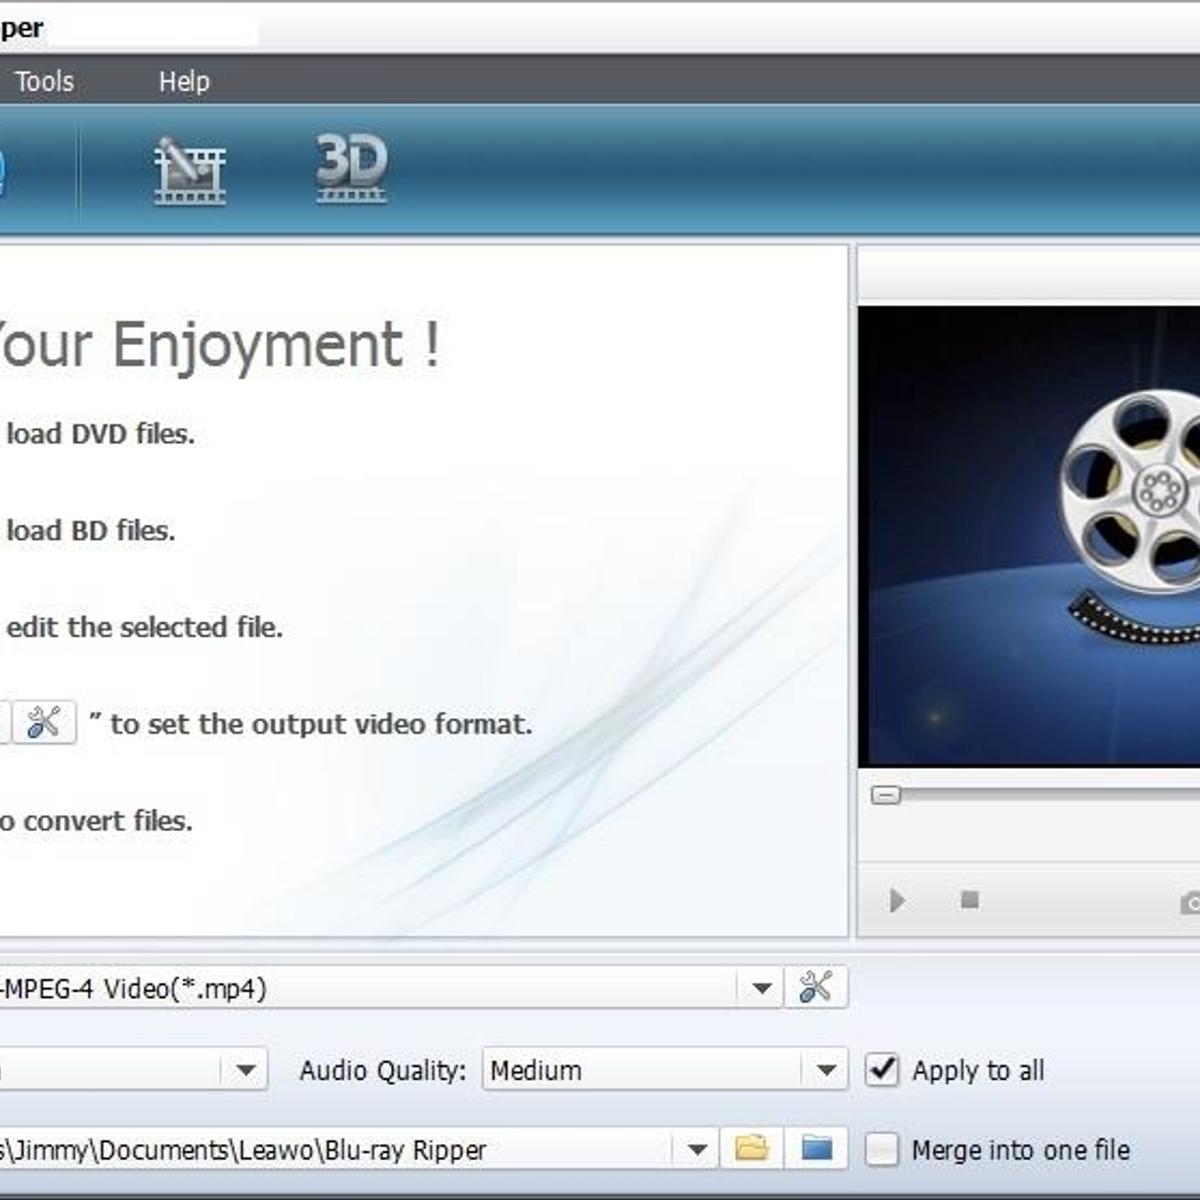 Leawo Blu-ray Ripper Alternatives and Similar Software